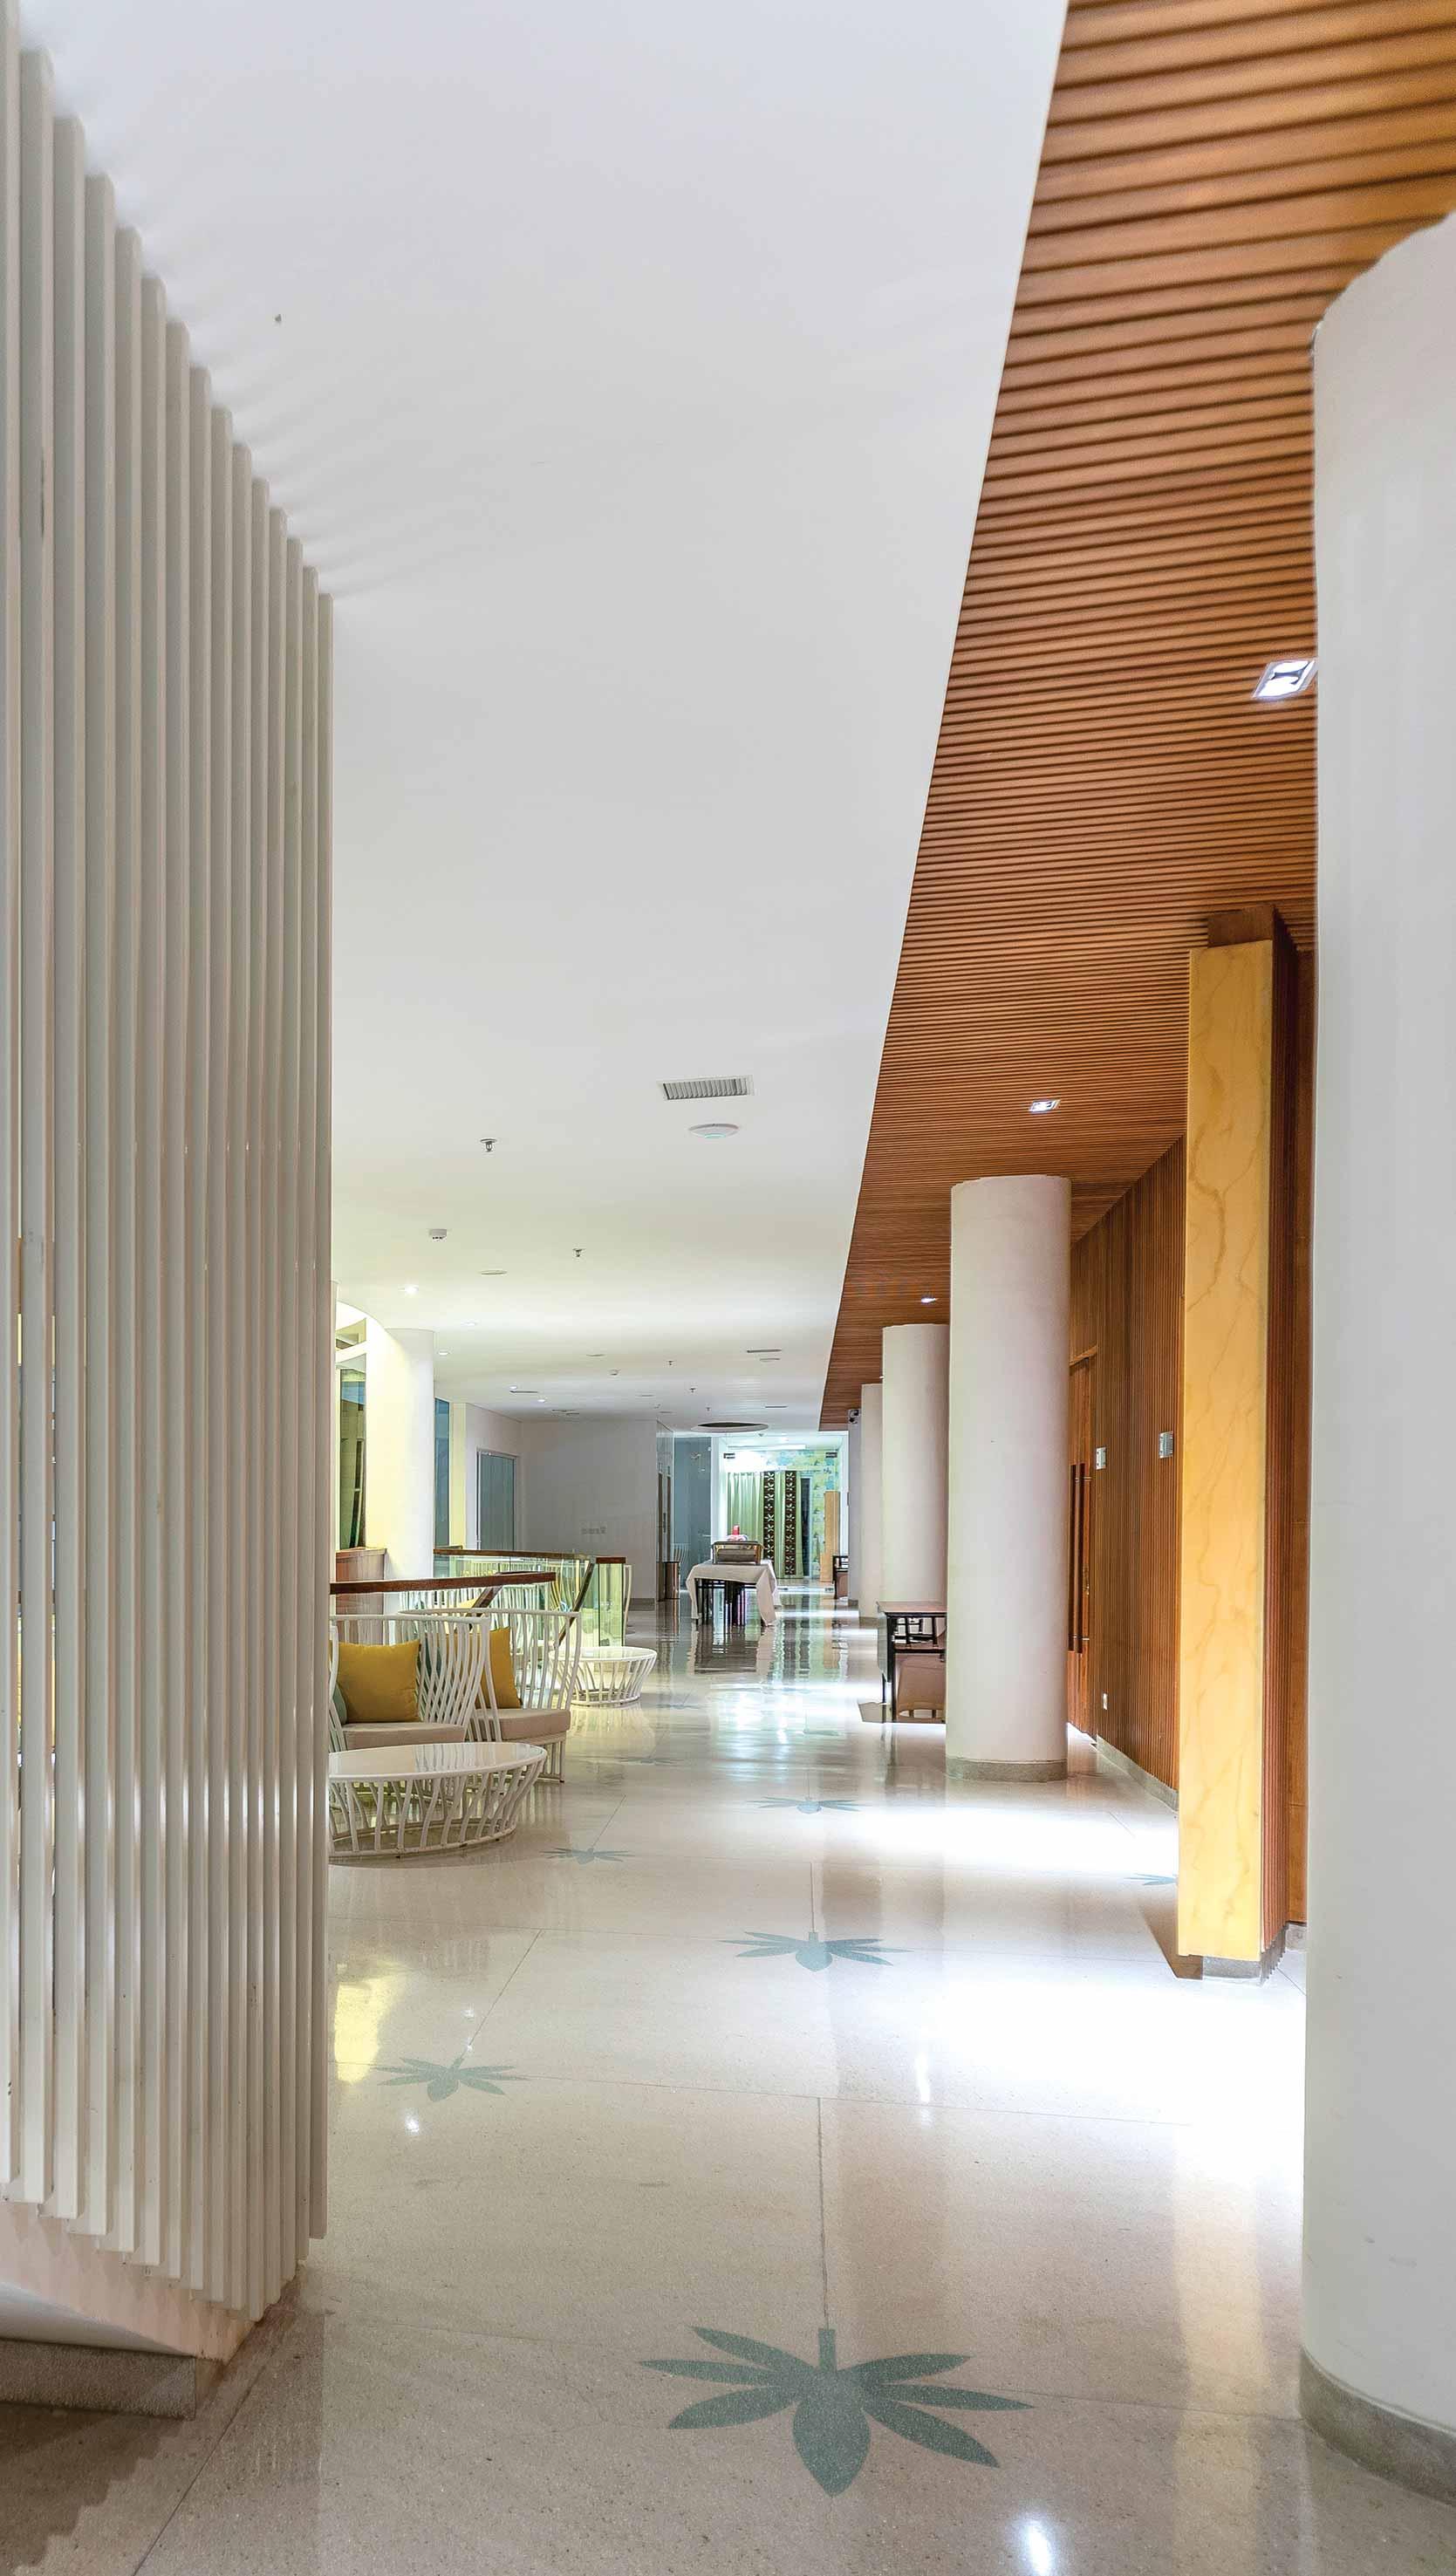 Amarta Hills Hotel And Resort - Construction Plus Asia